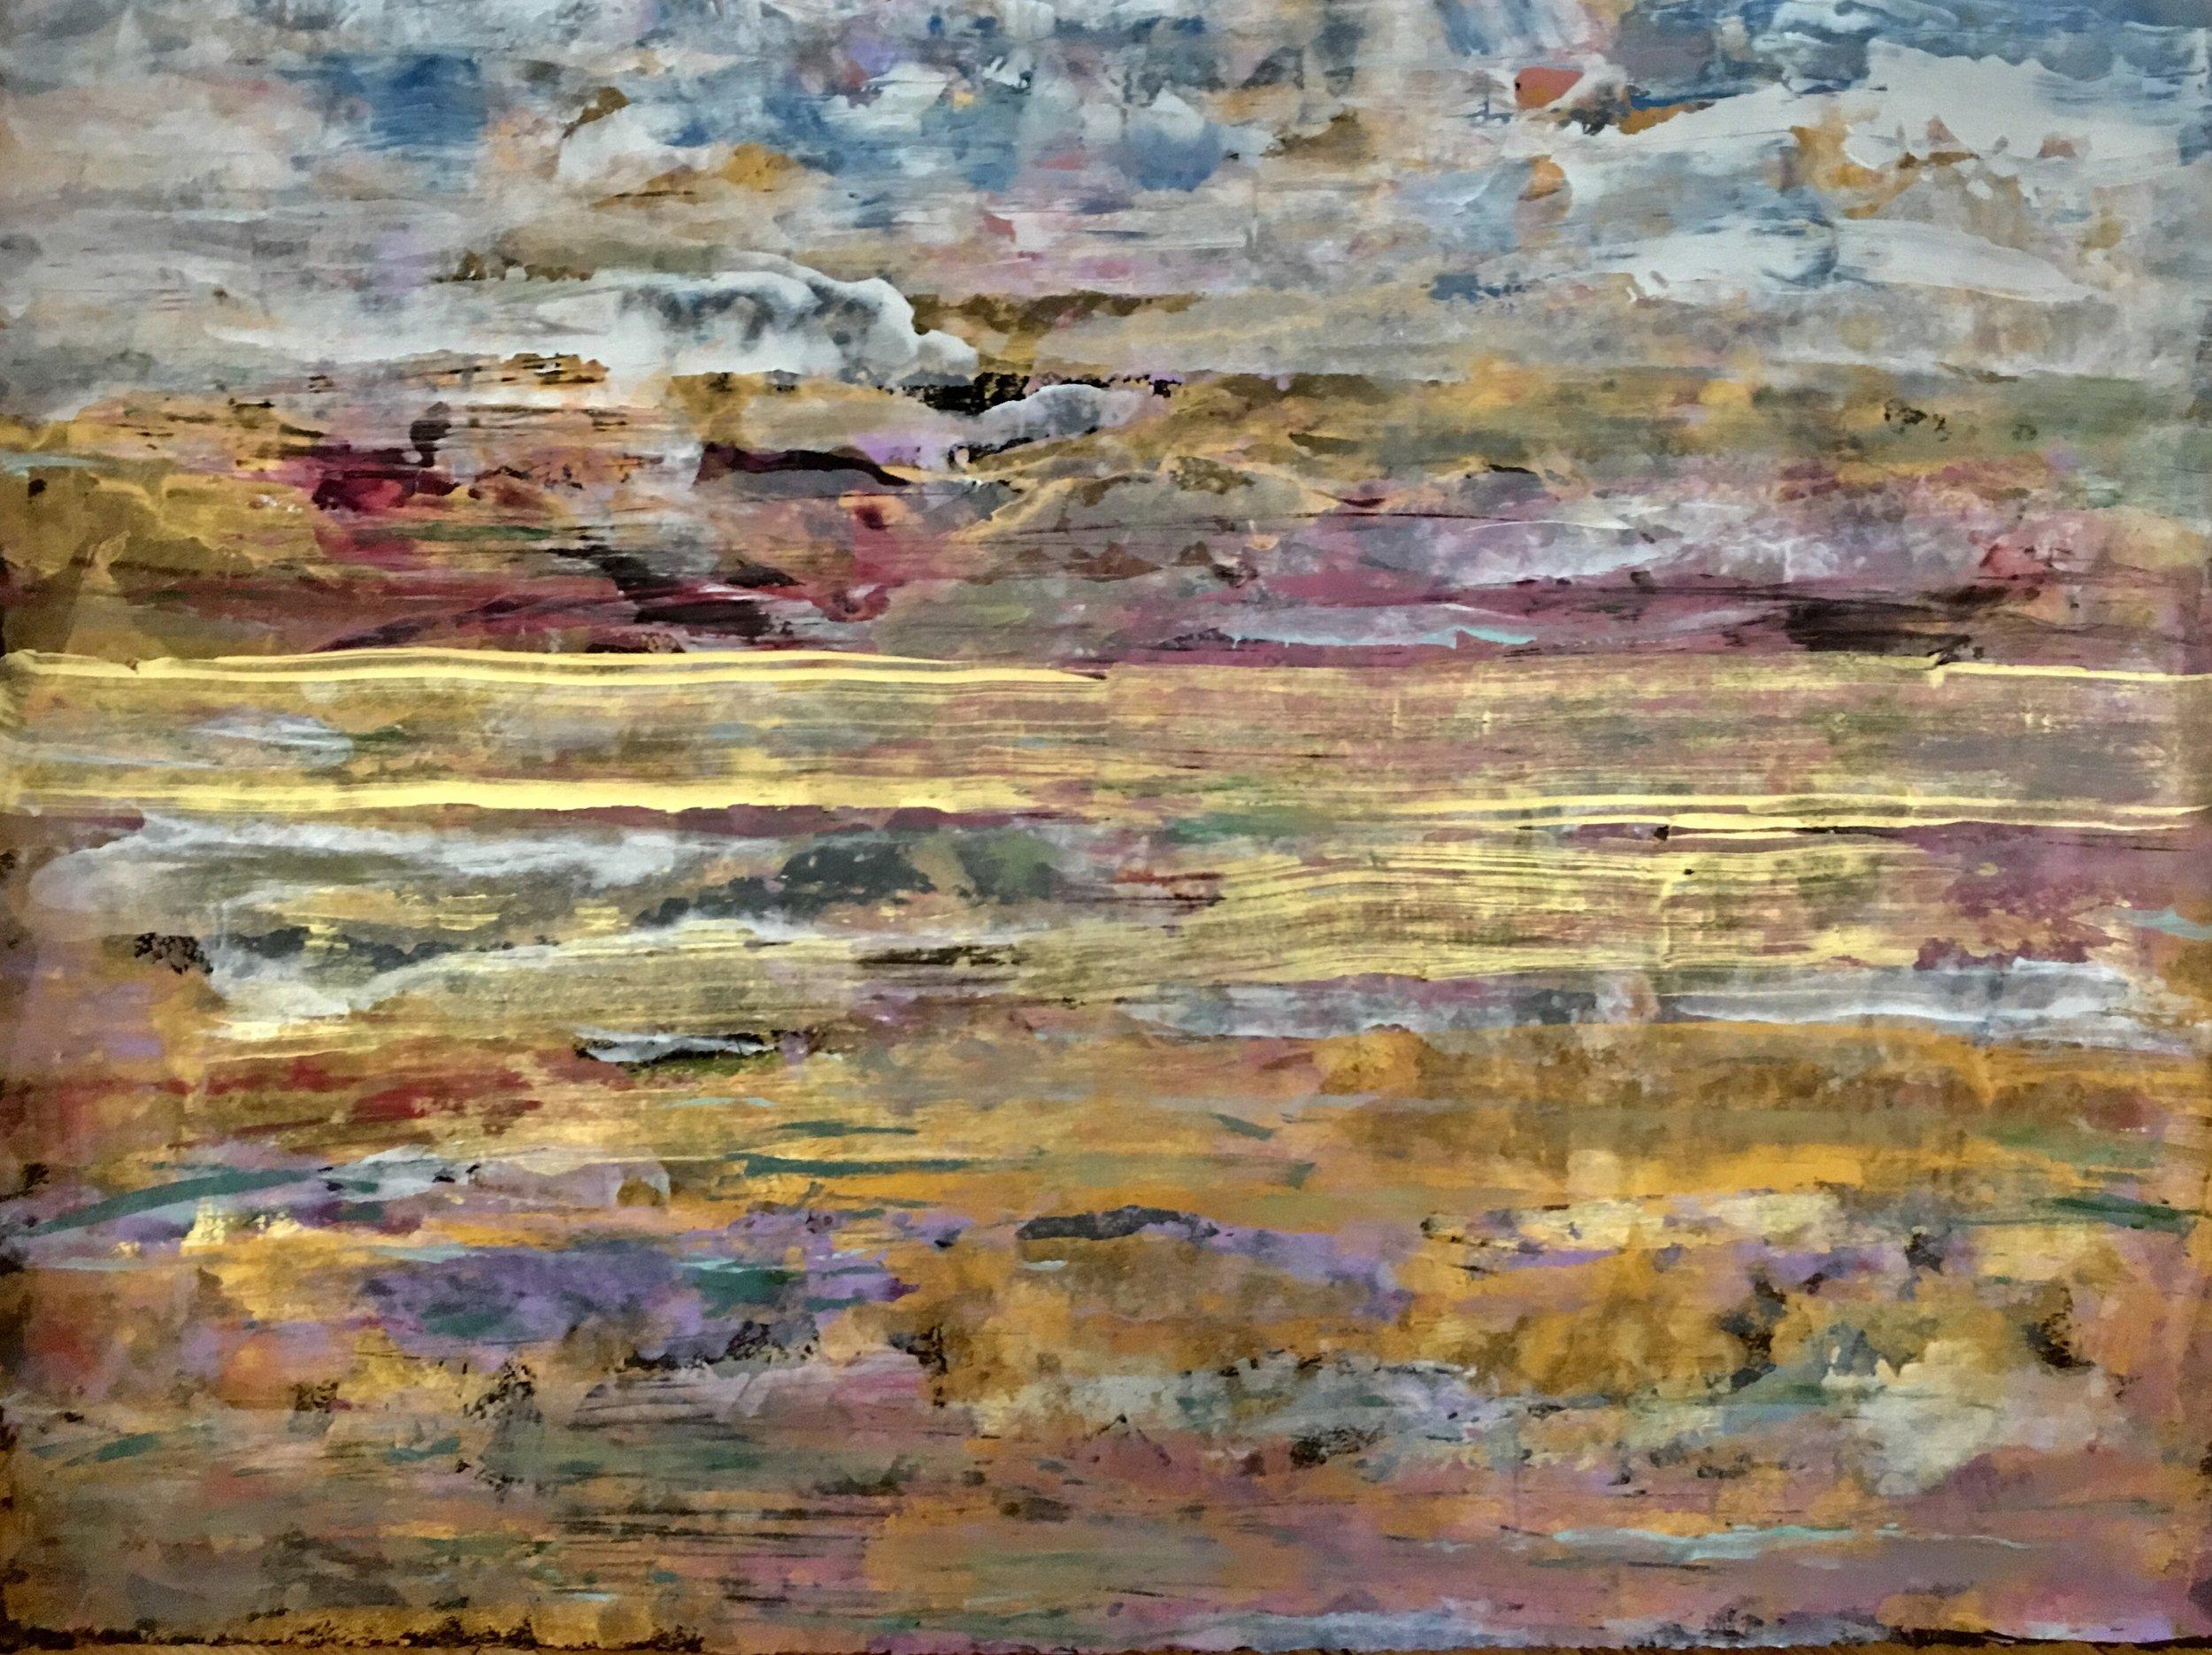 20496930-YelenaLezhen_The Golden Prairie_Painting_22x30_$1500.jpg